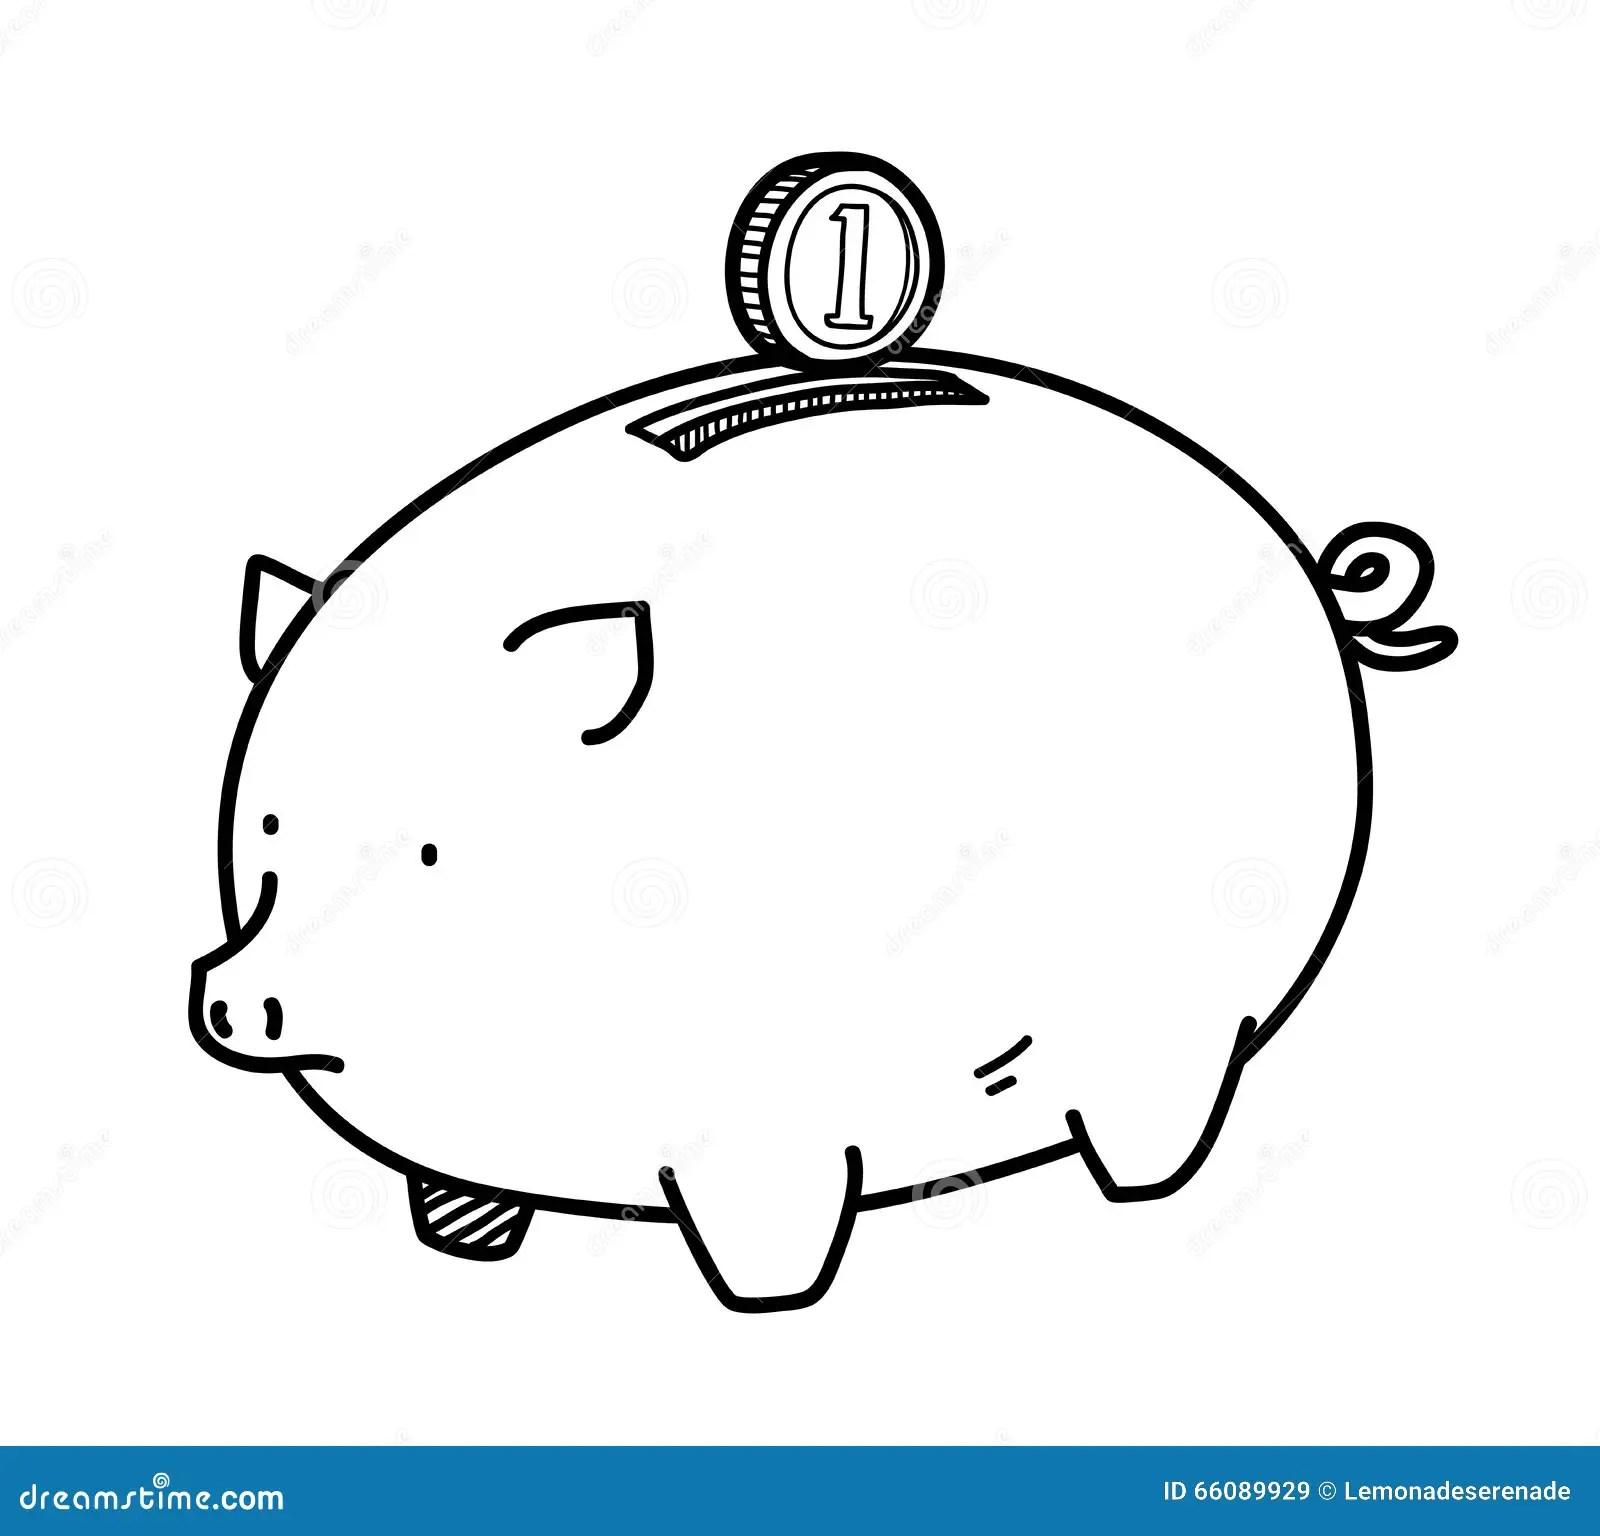 Piggy Bank Doodle Stock Vector Image Of Design